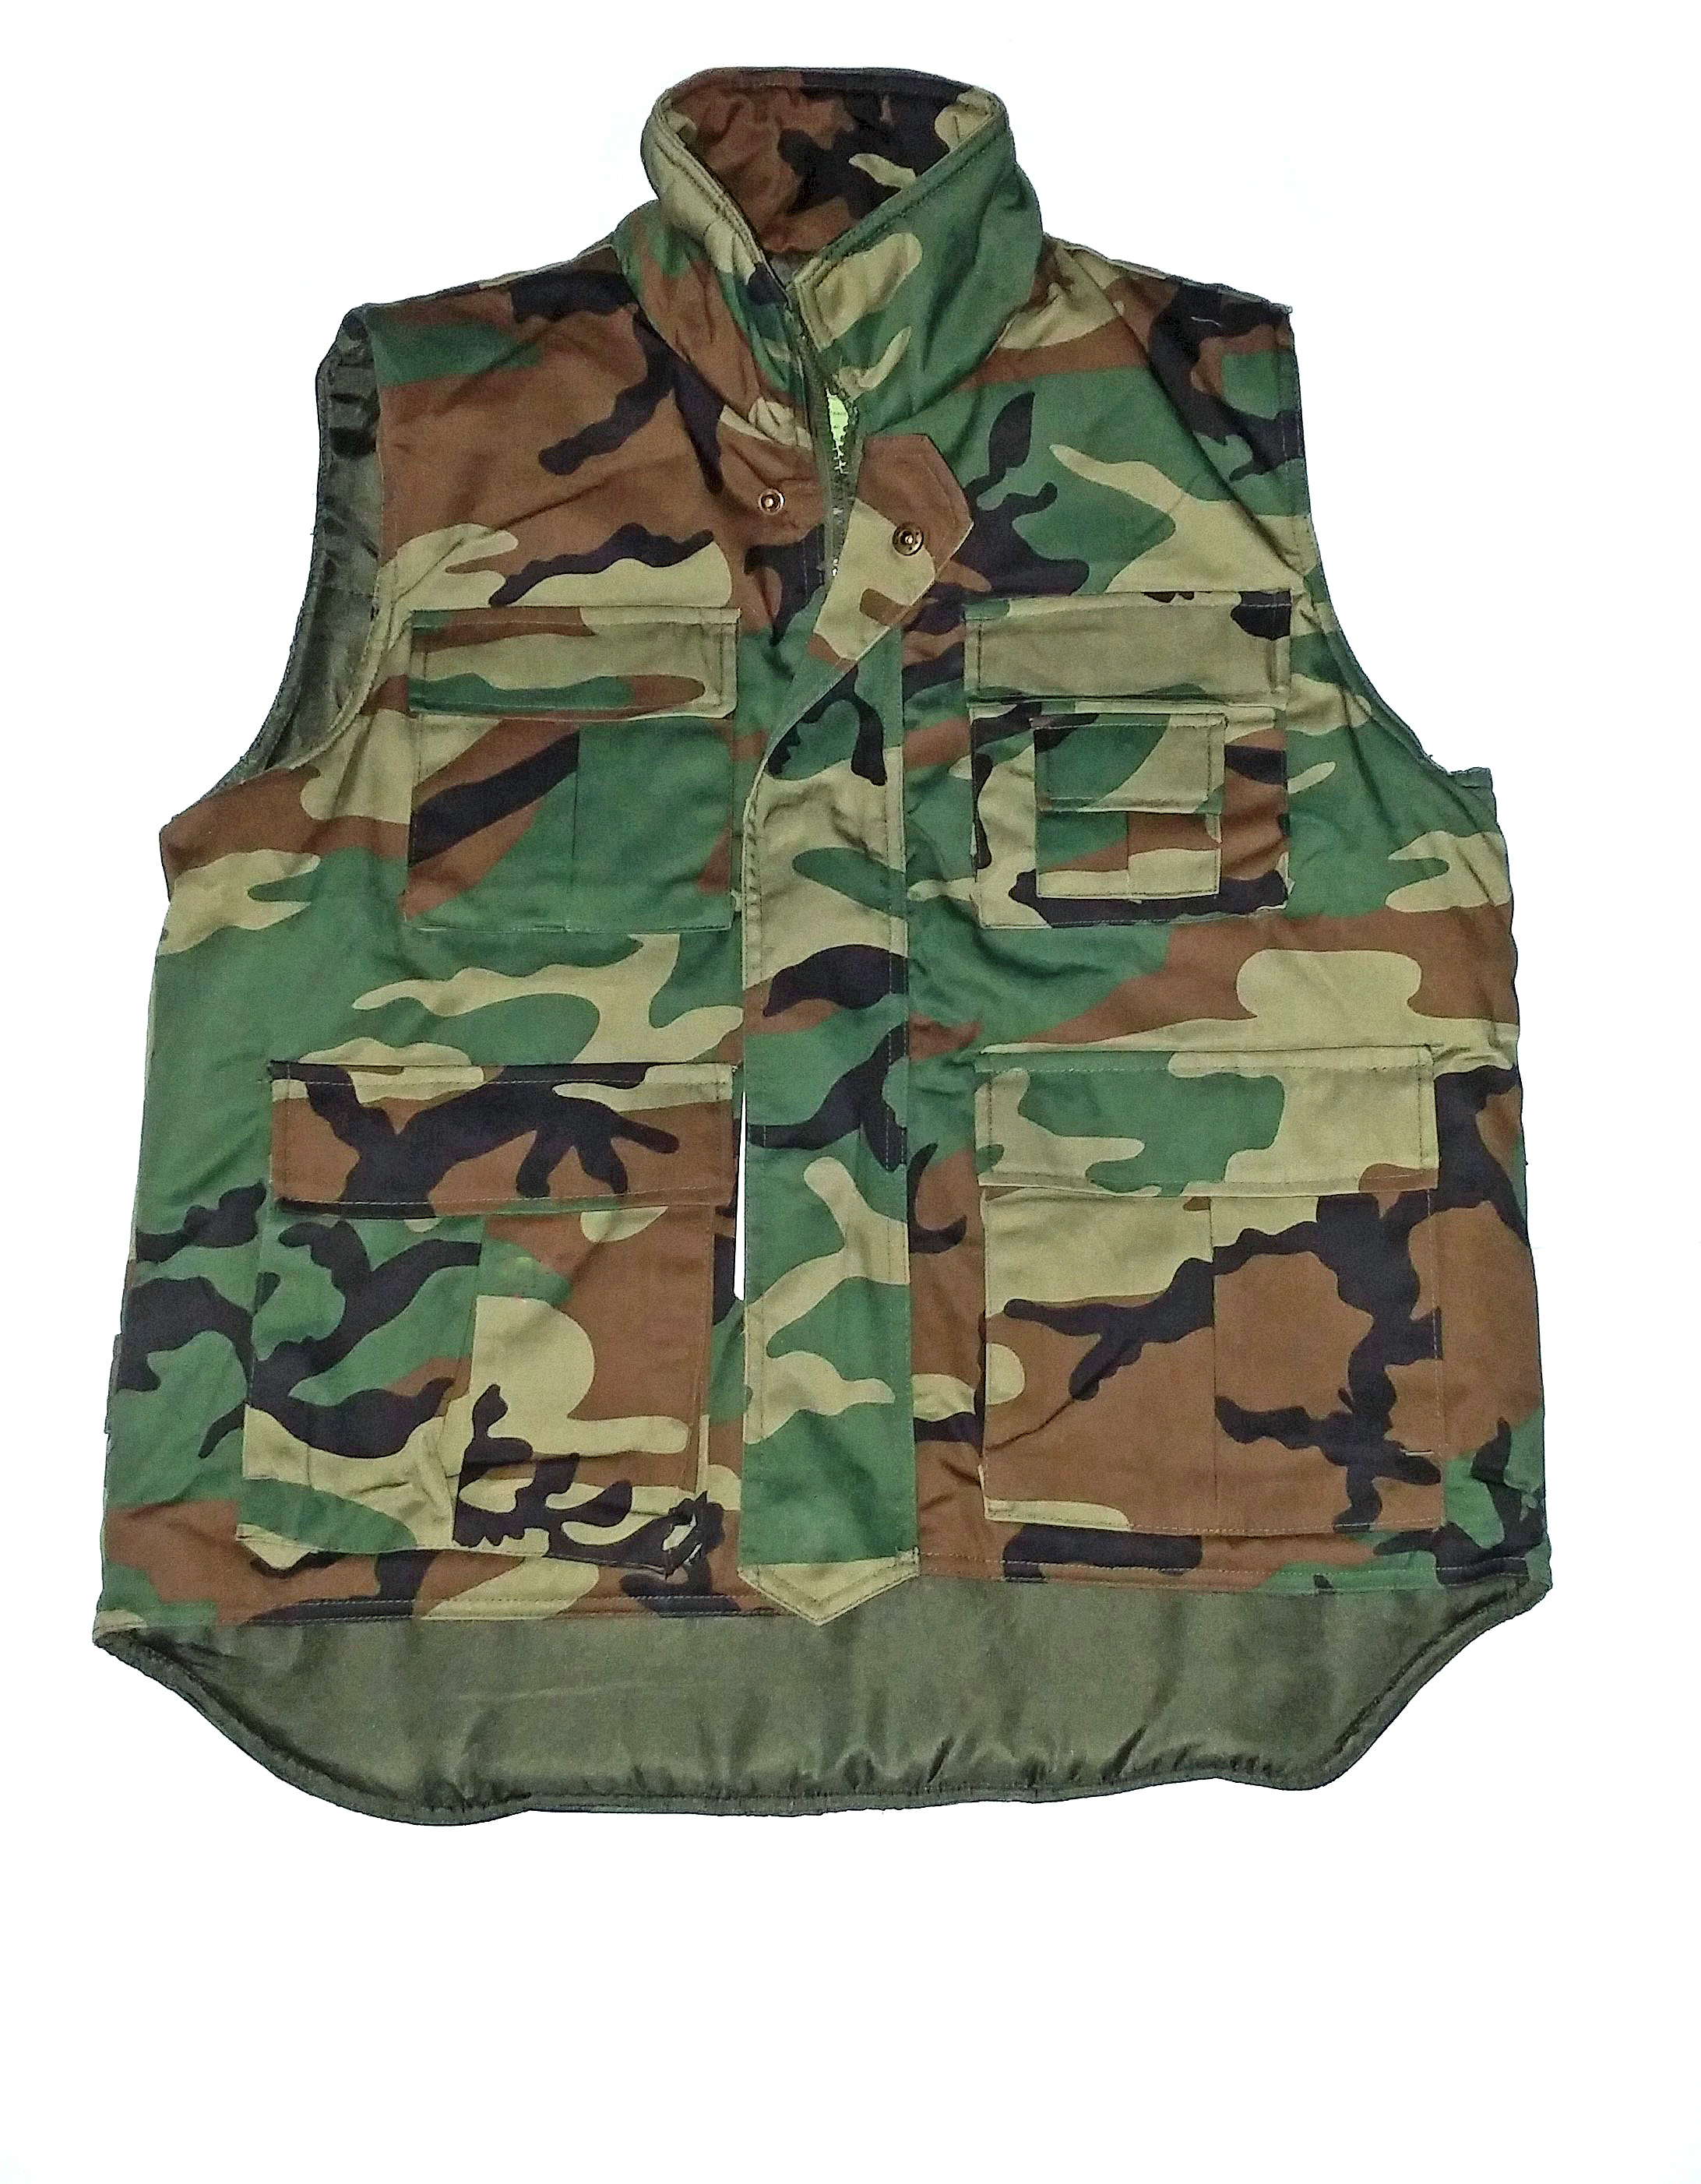 Veste de ranger - camouflage